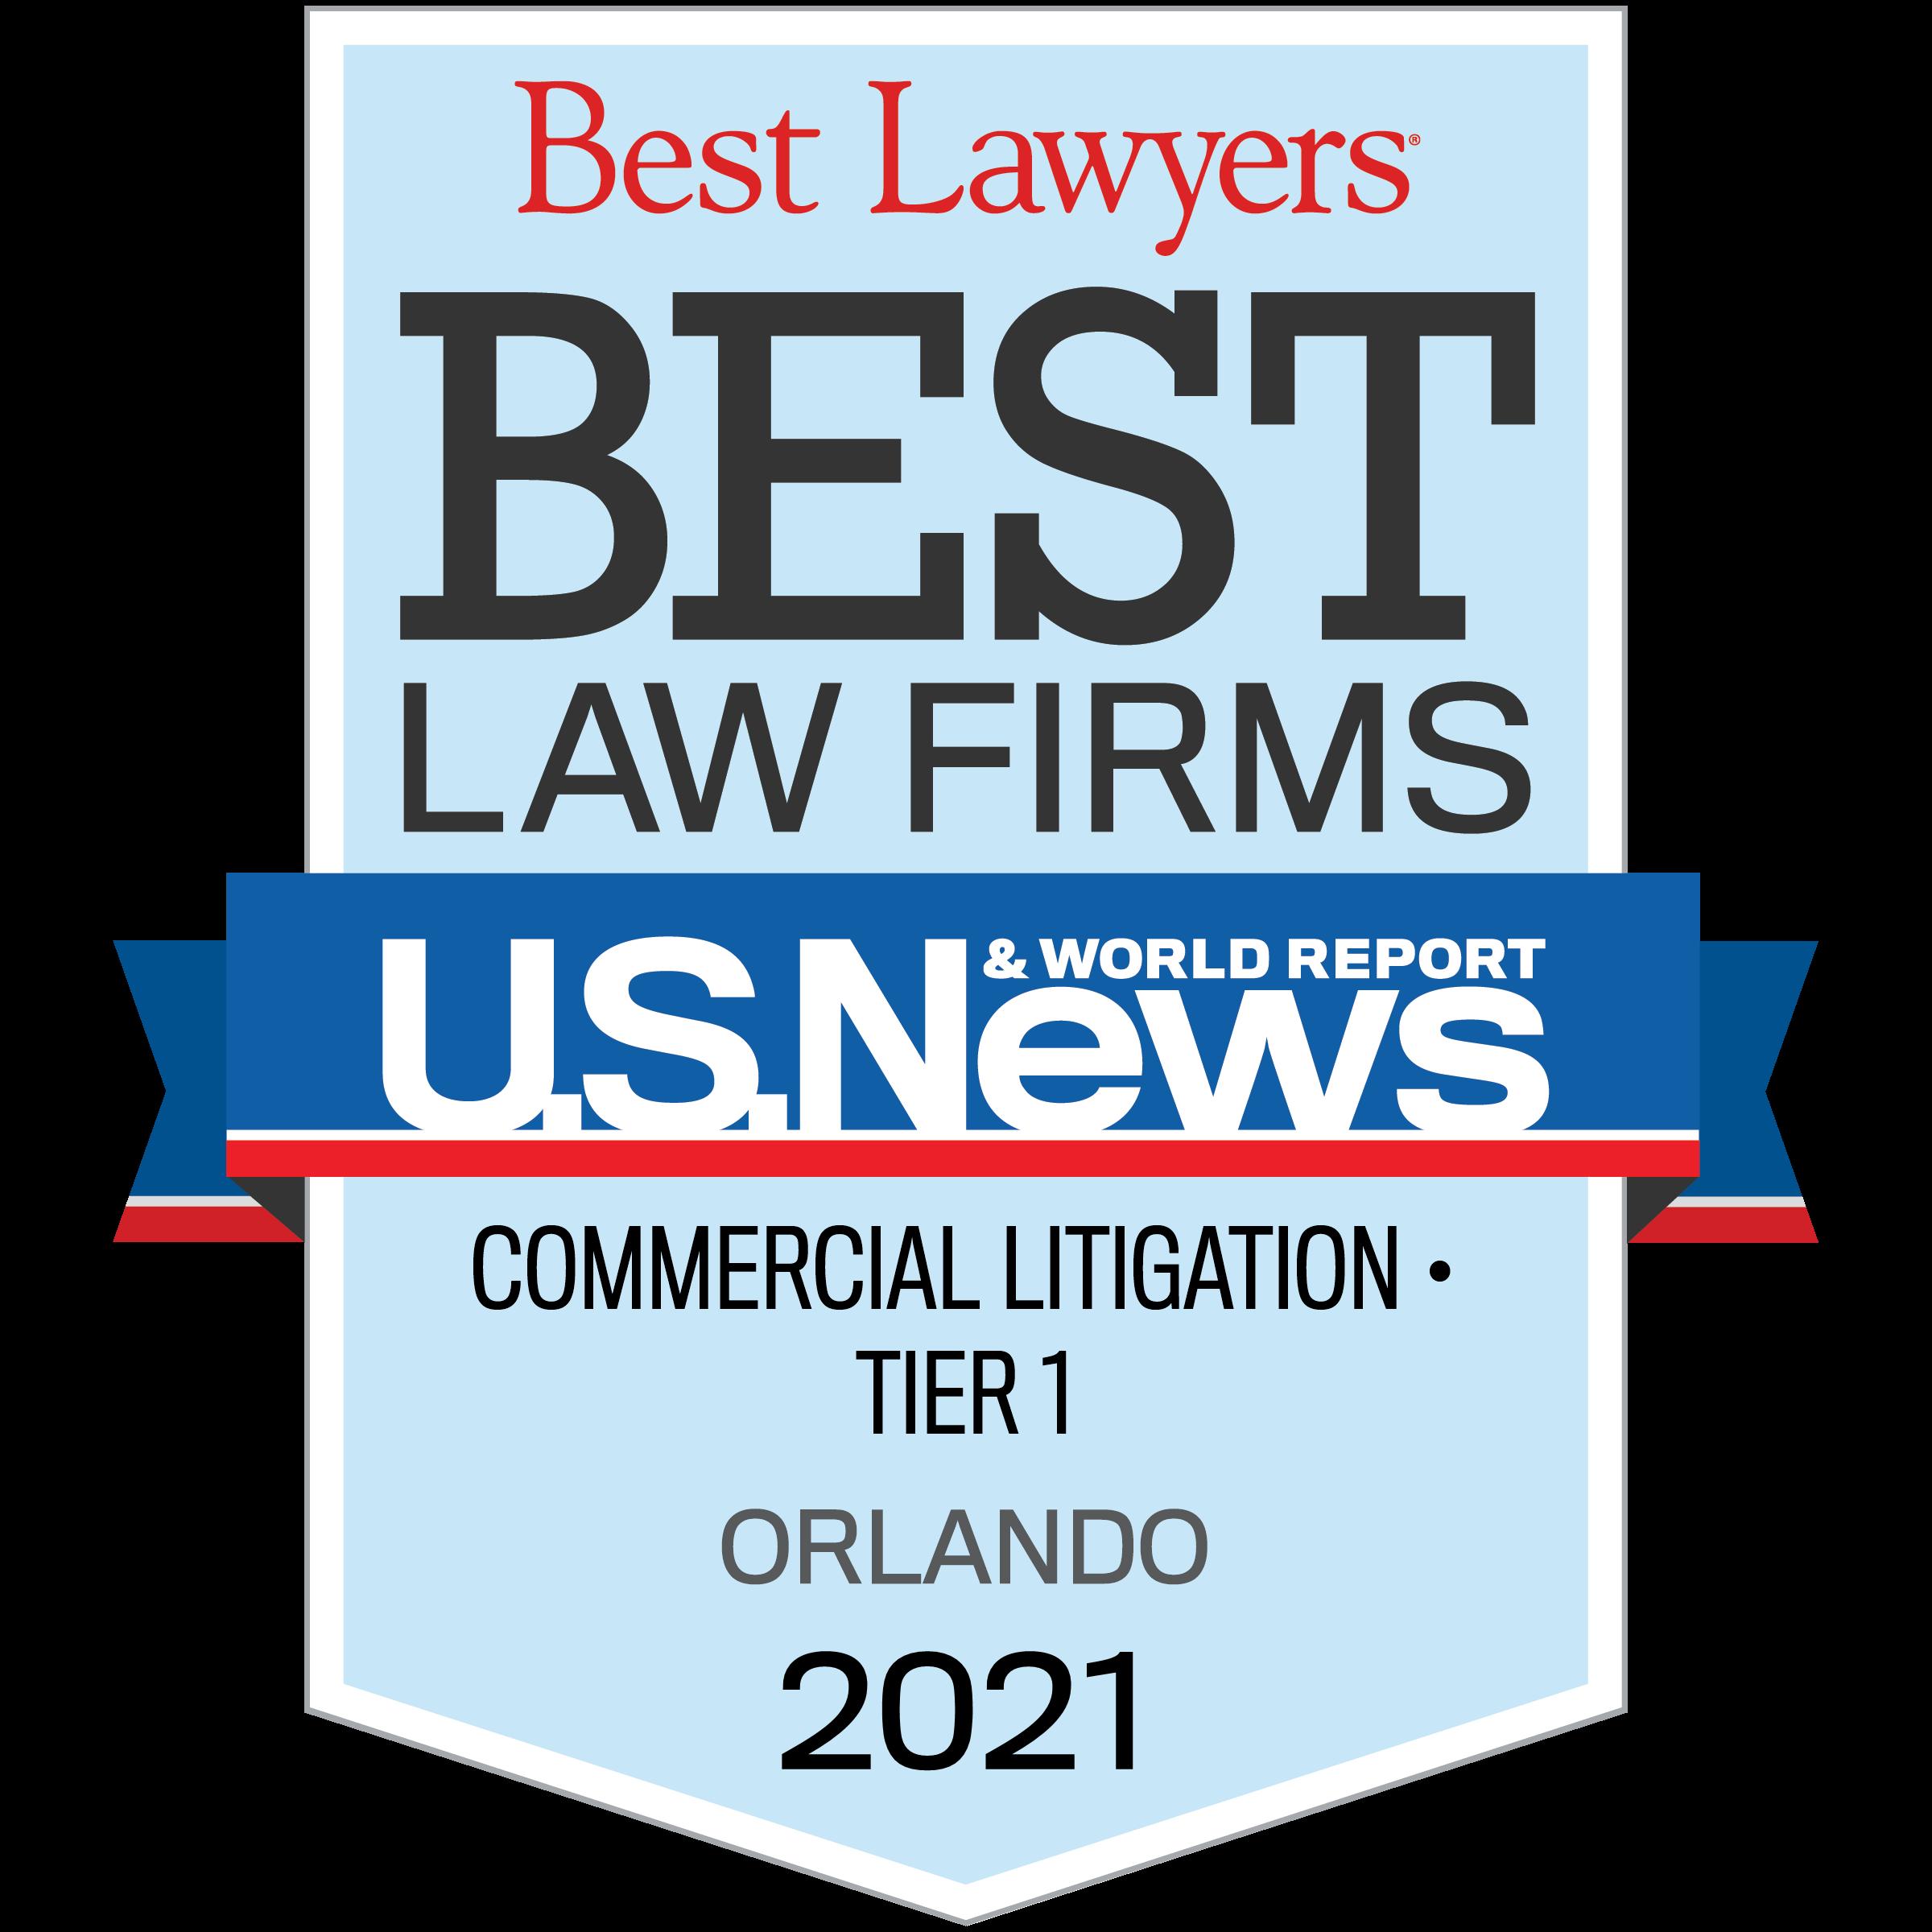 Best Lawyers Tier 1 - Commercial Litigation